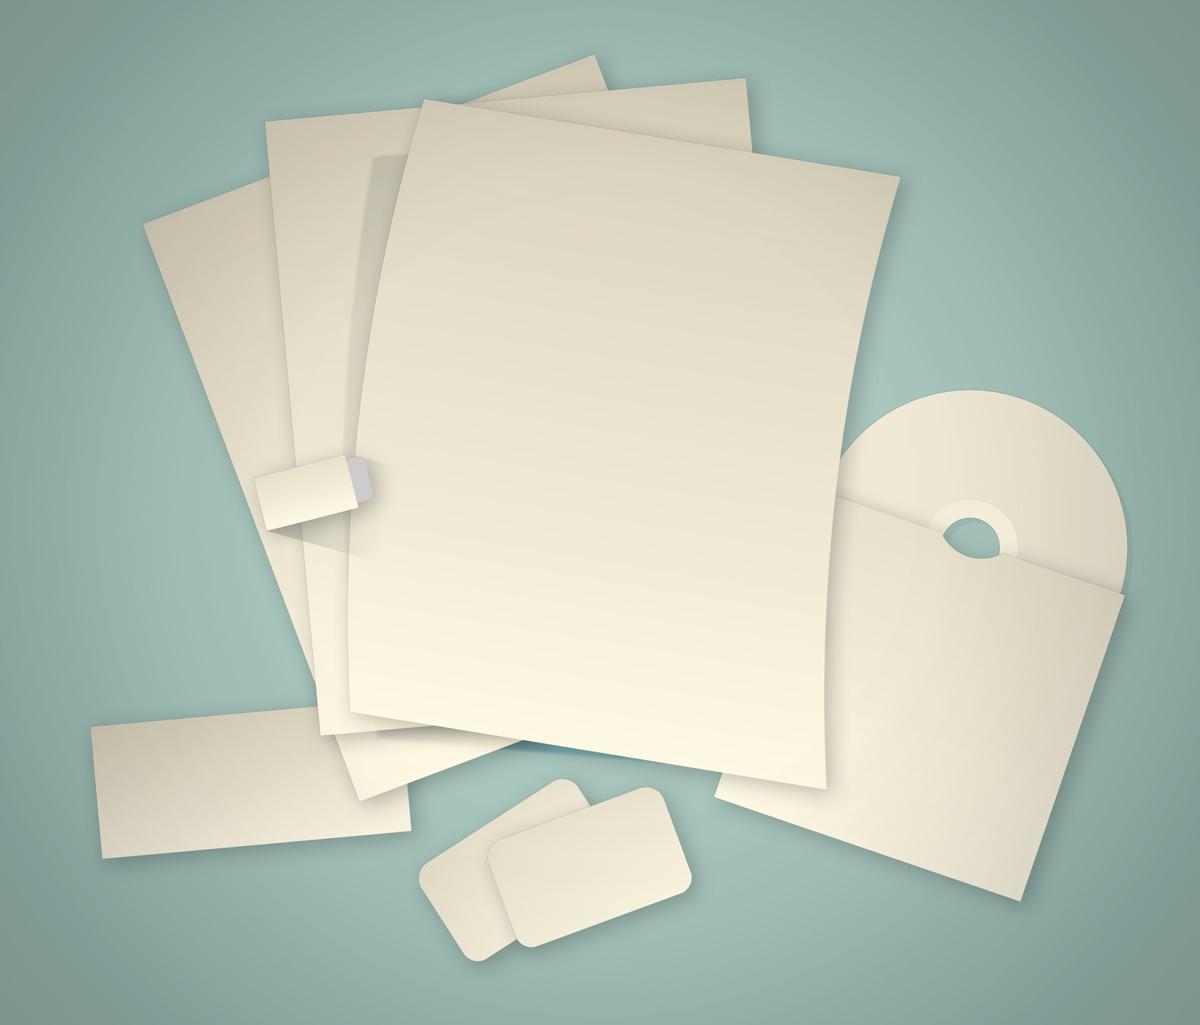 branding_stationery_flat_template12